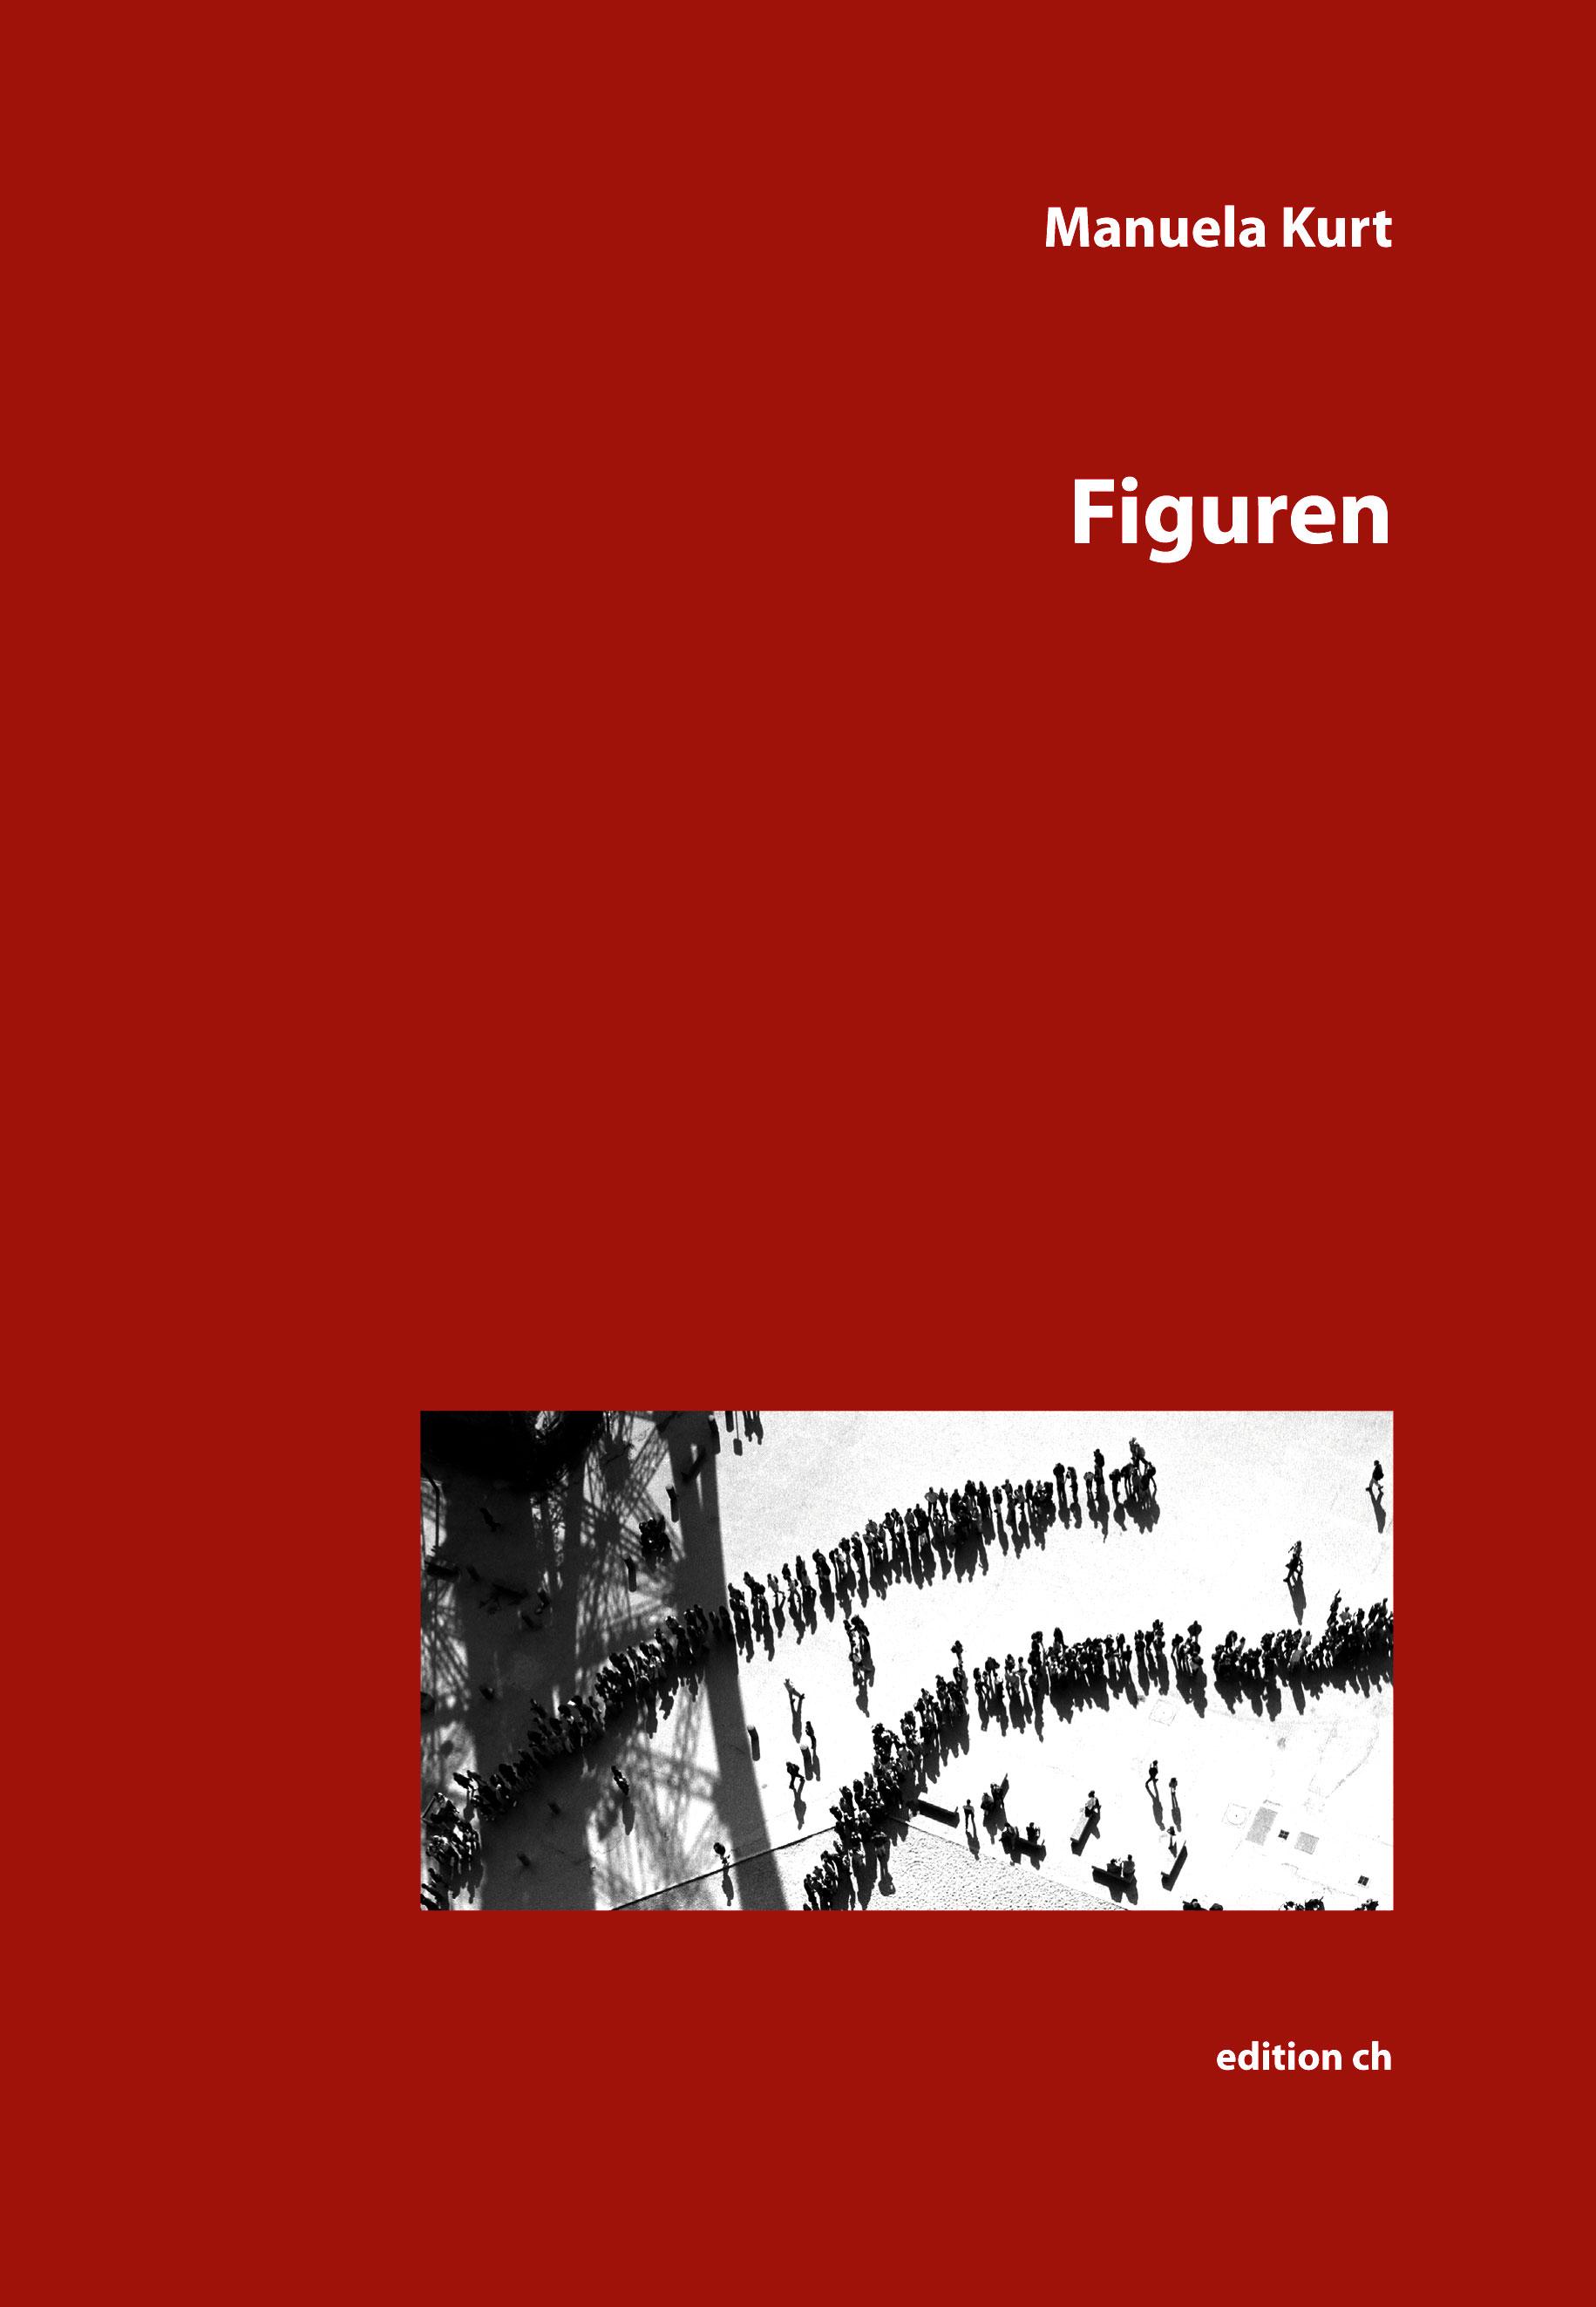 Cover Manuela Kurt Figuren